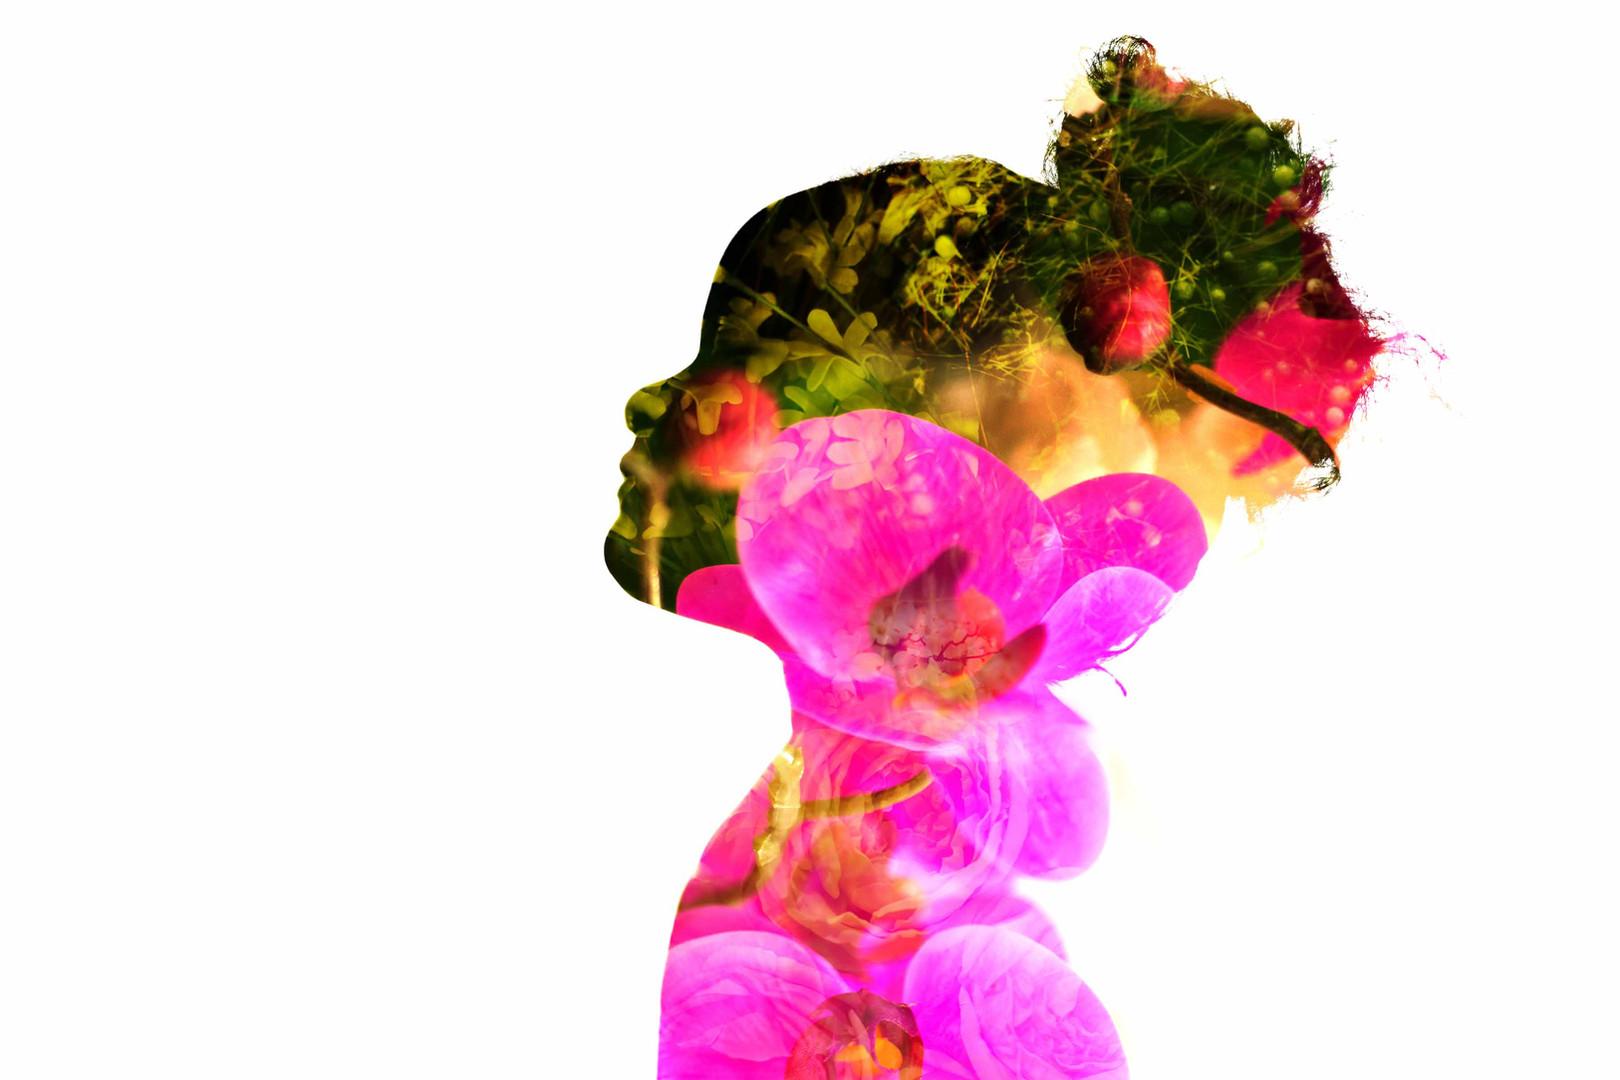 20140224-JMP_9179 flower child perspecti